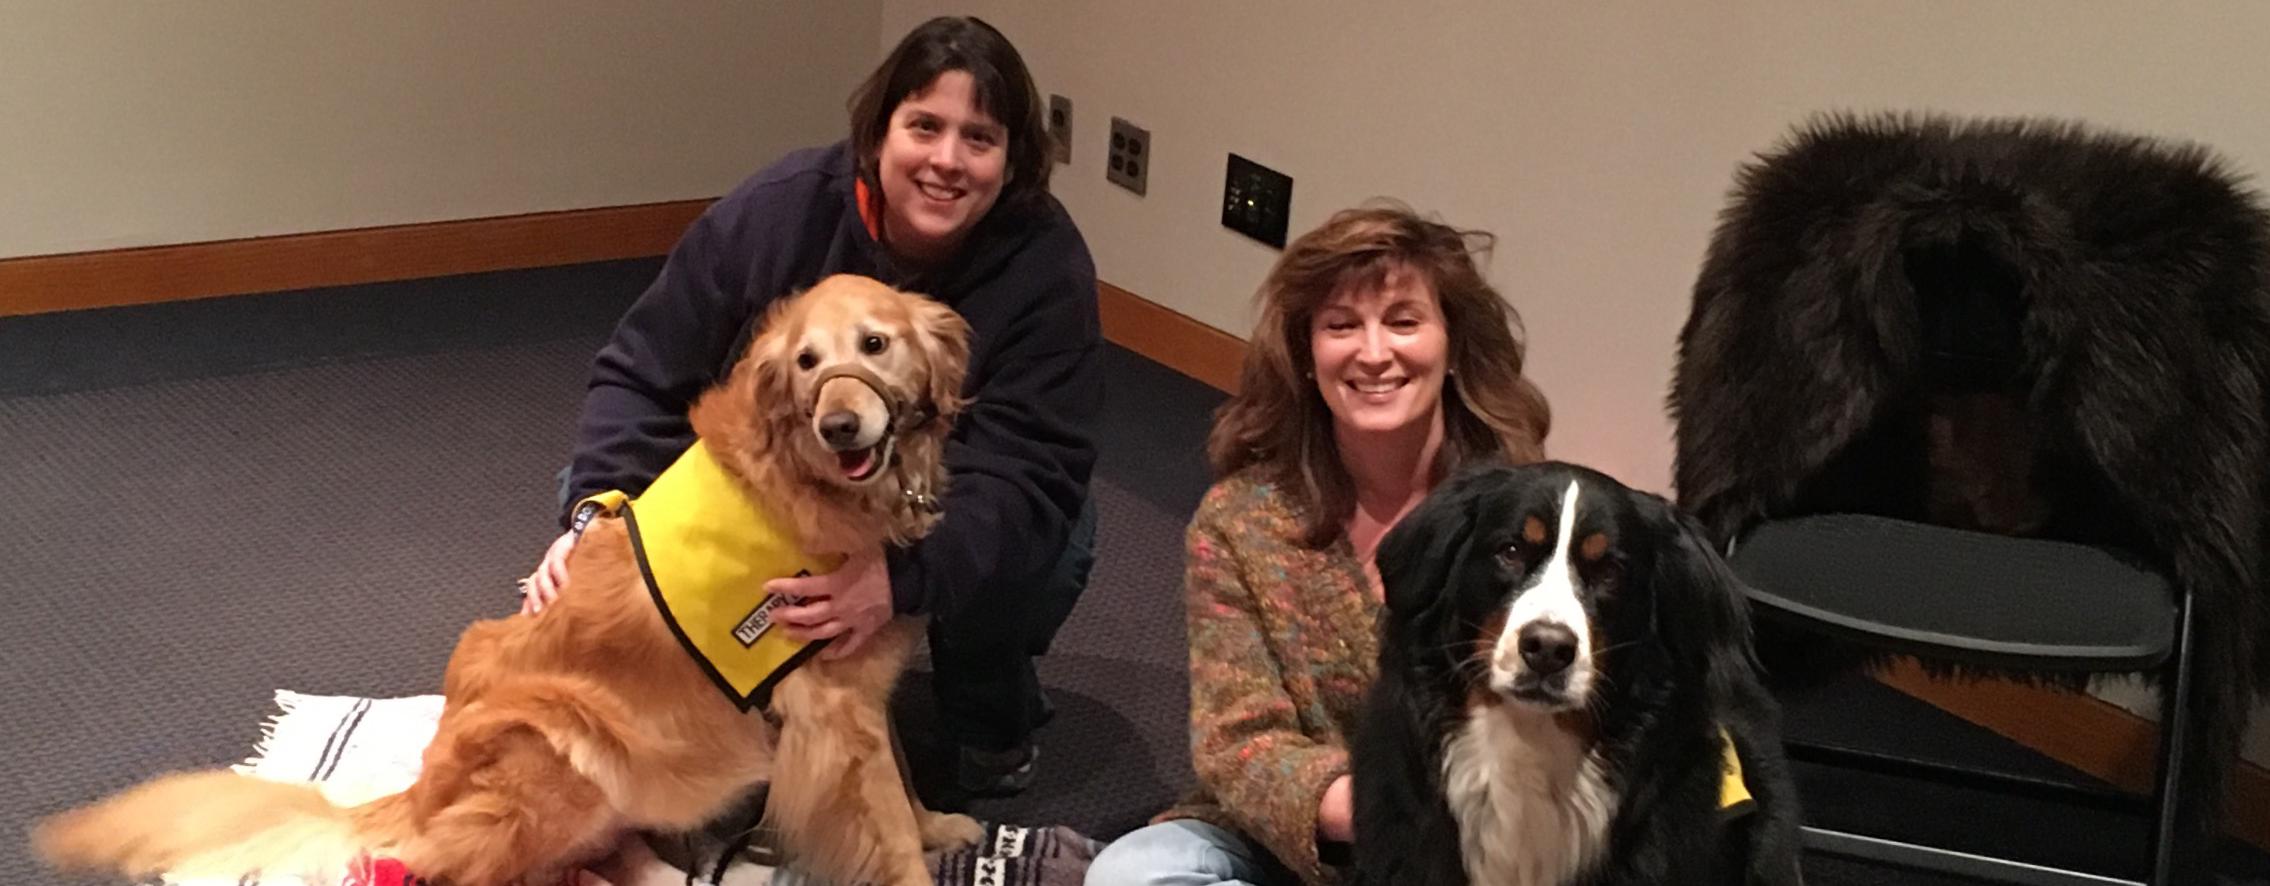 Pet_Therapy_Syracuse_University_Horiz